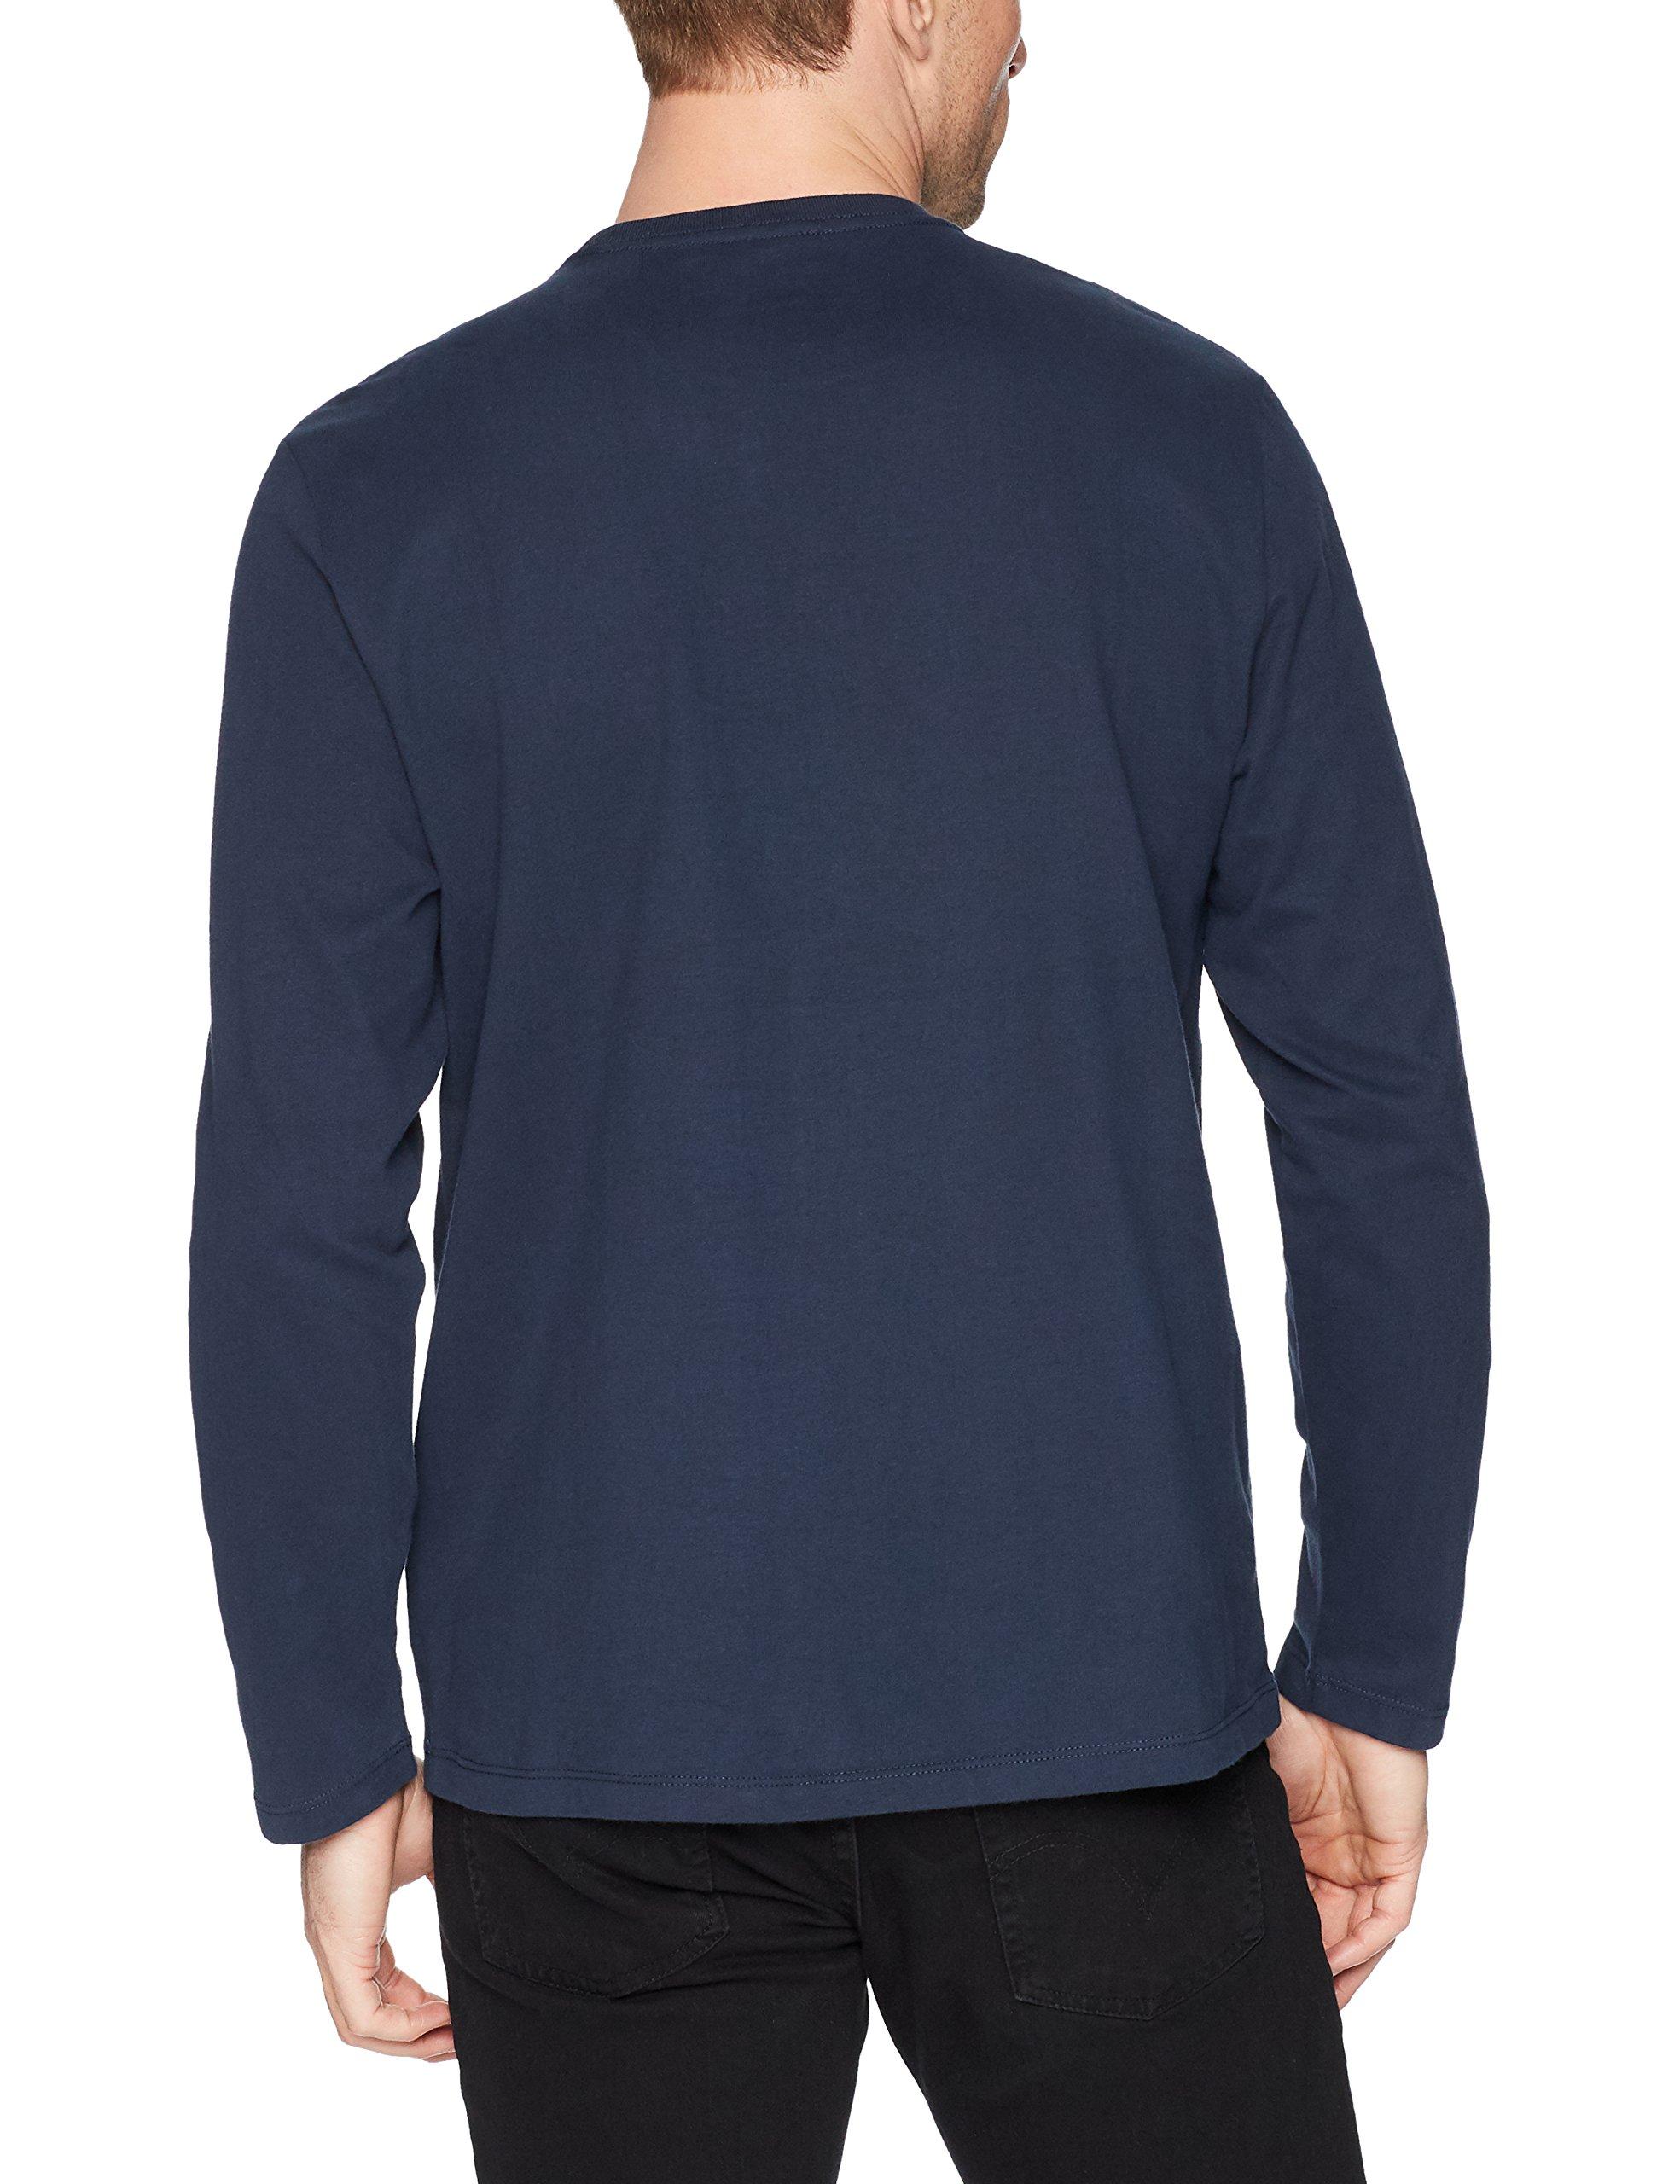 Amazon Essentials Men's Regular-Fit Long-Sleeve T-Shirt, Navy, Medium by Amazon Essentials (Image #4)